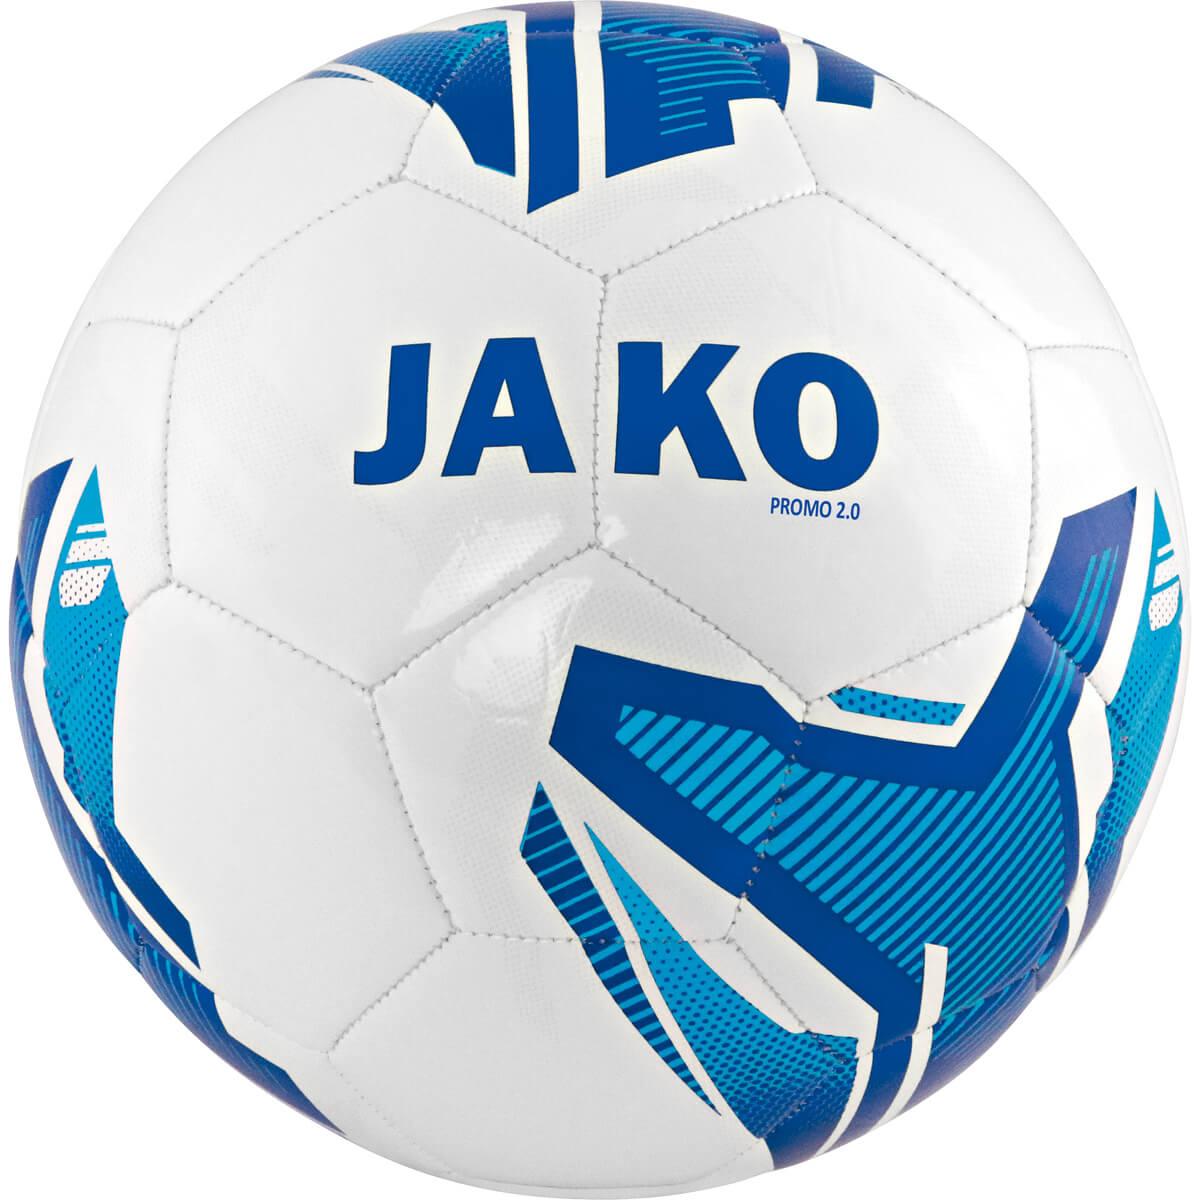 Jako Ball Promo 2.0  2310  | div. Größen / Farben